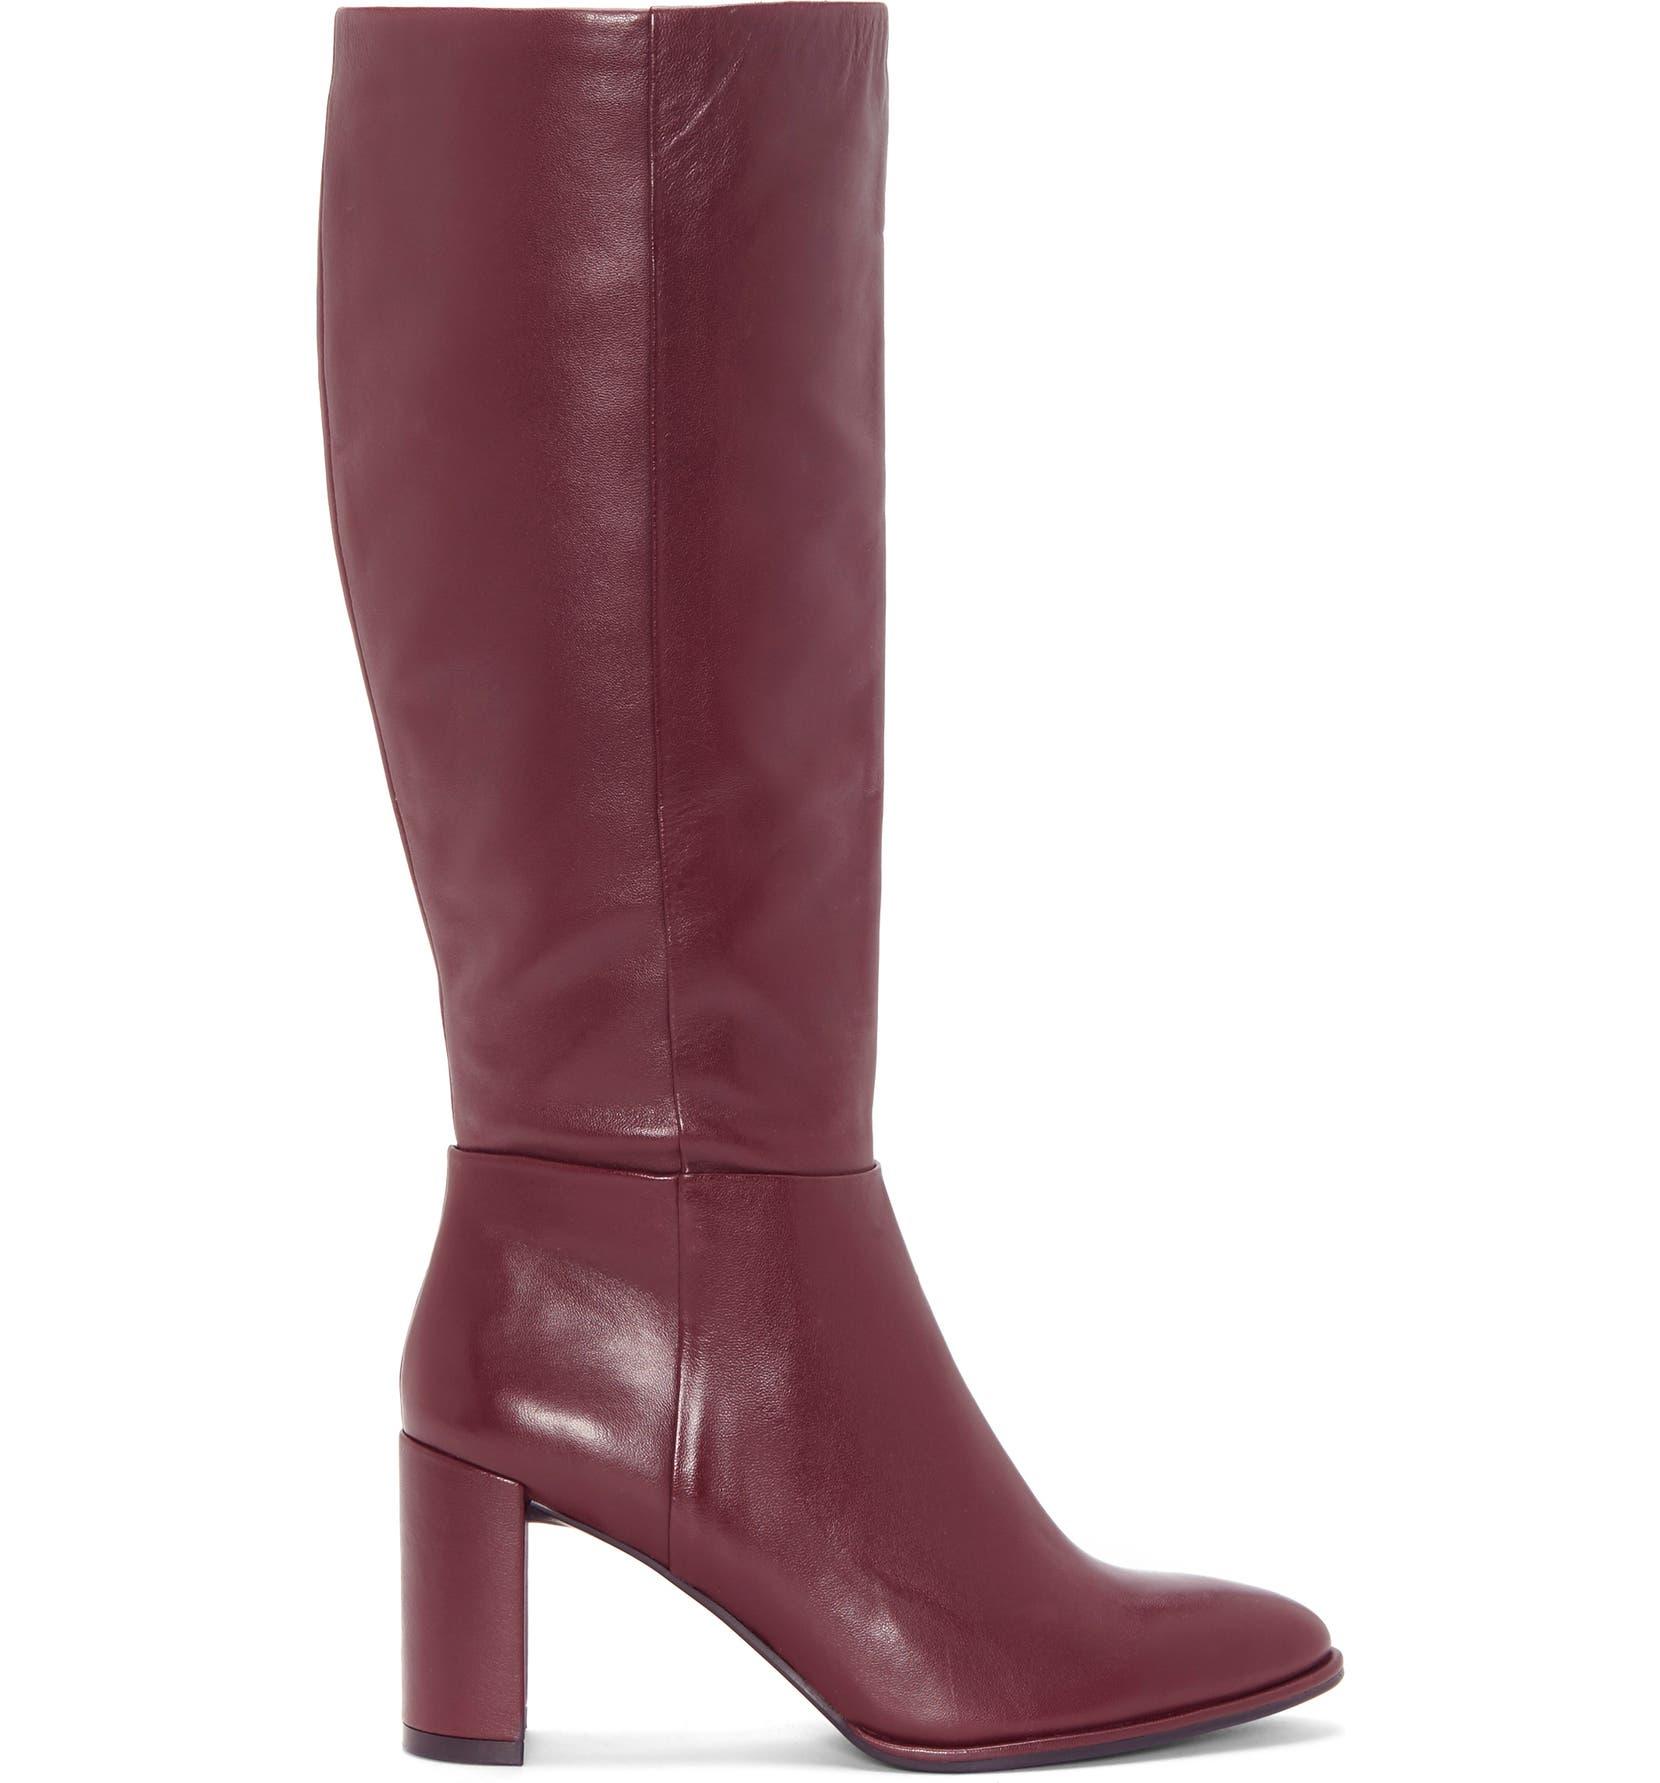 2477b733f8fffc Enzo Angiolini Wenda Knee High Boot (Women) (Narrow Calf)